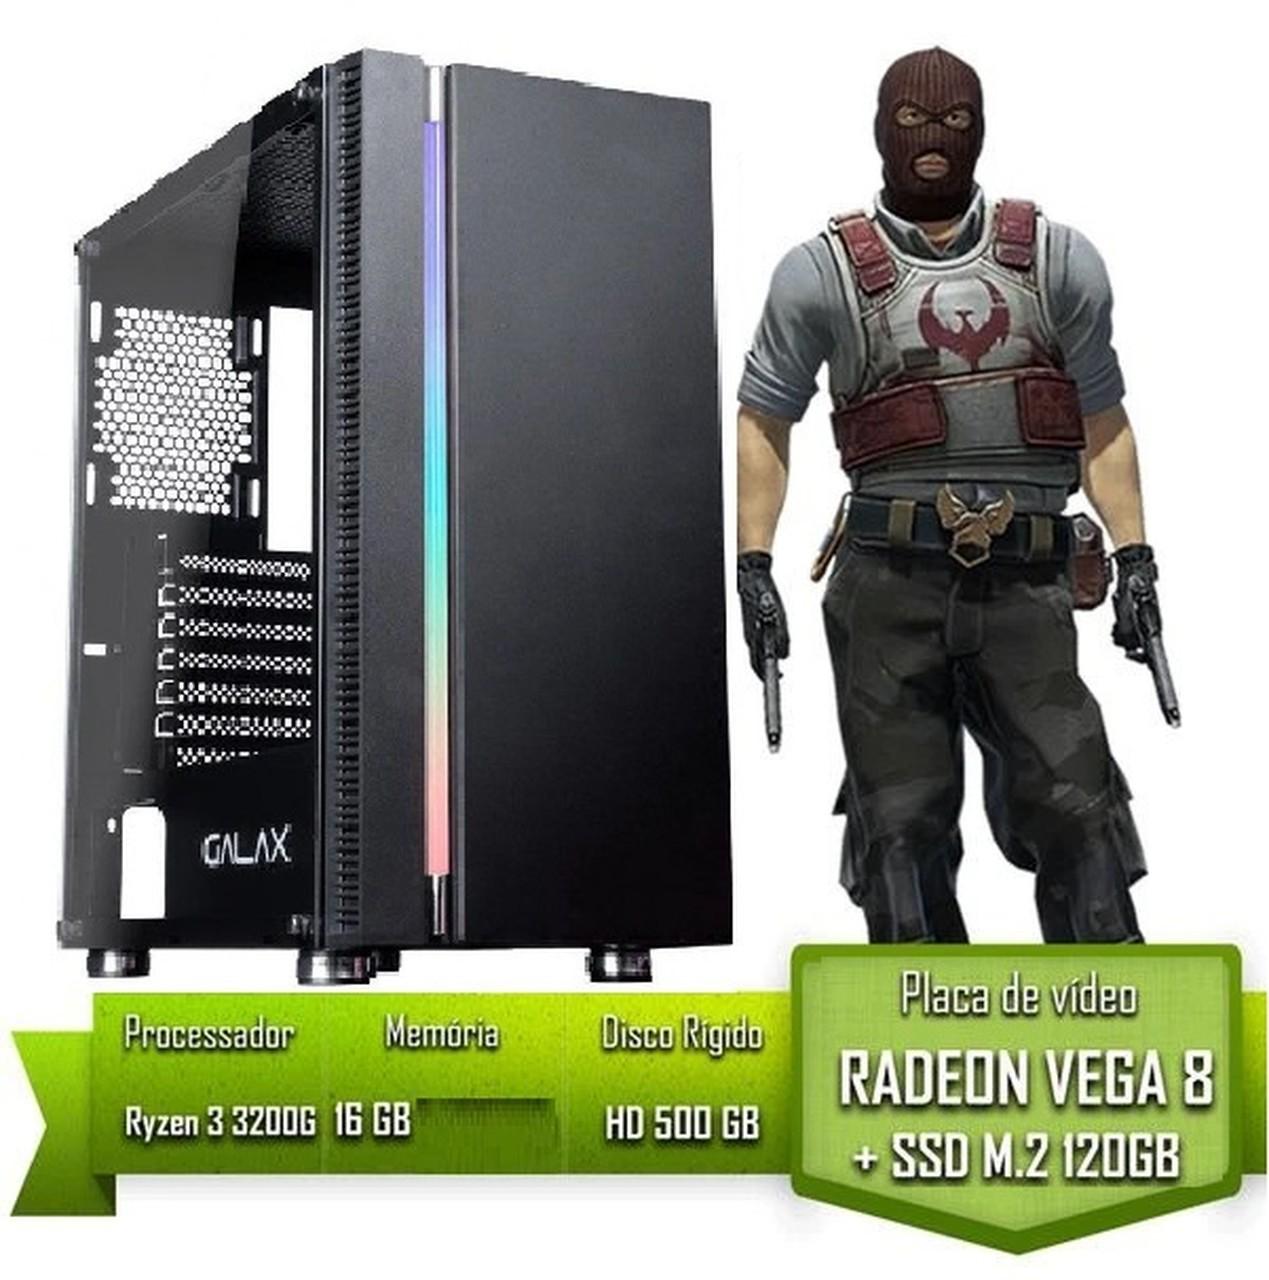 PC GAMER AMD RYZEN 3 3200G / 16GB 3000MHZ / SSD 120GB M.2 /HD 500GB